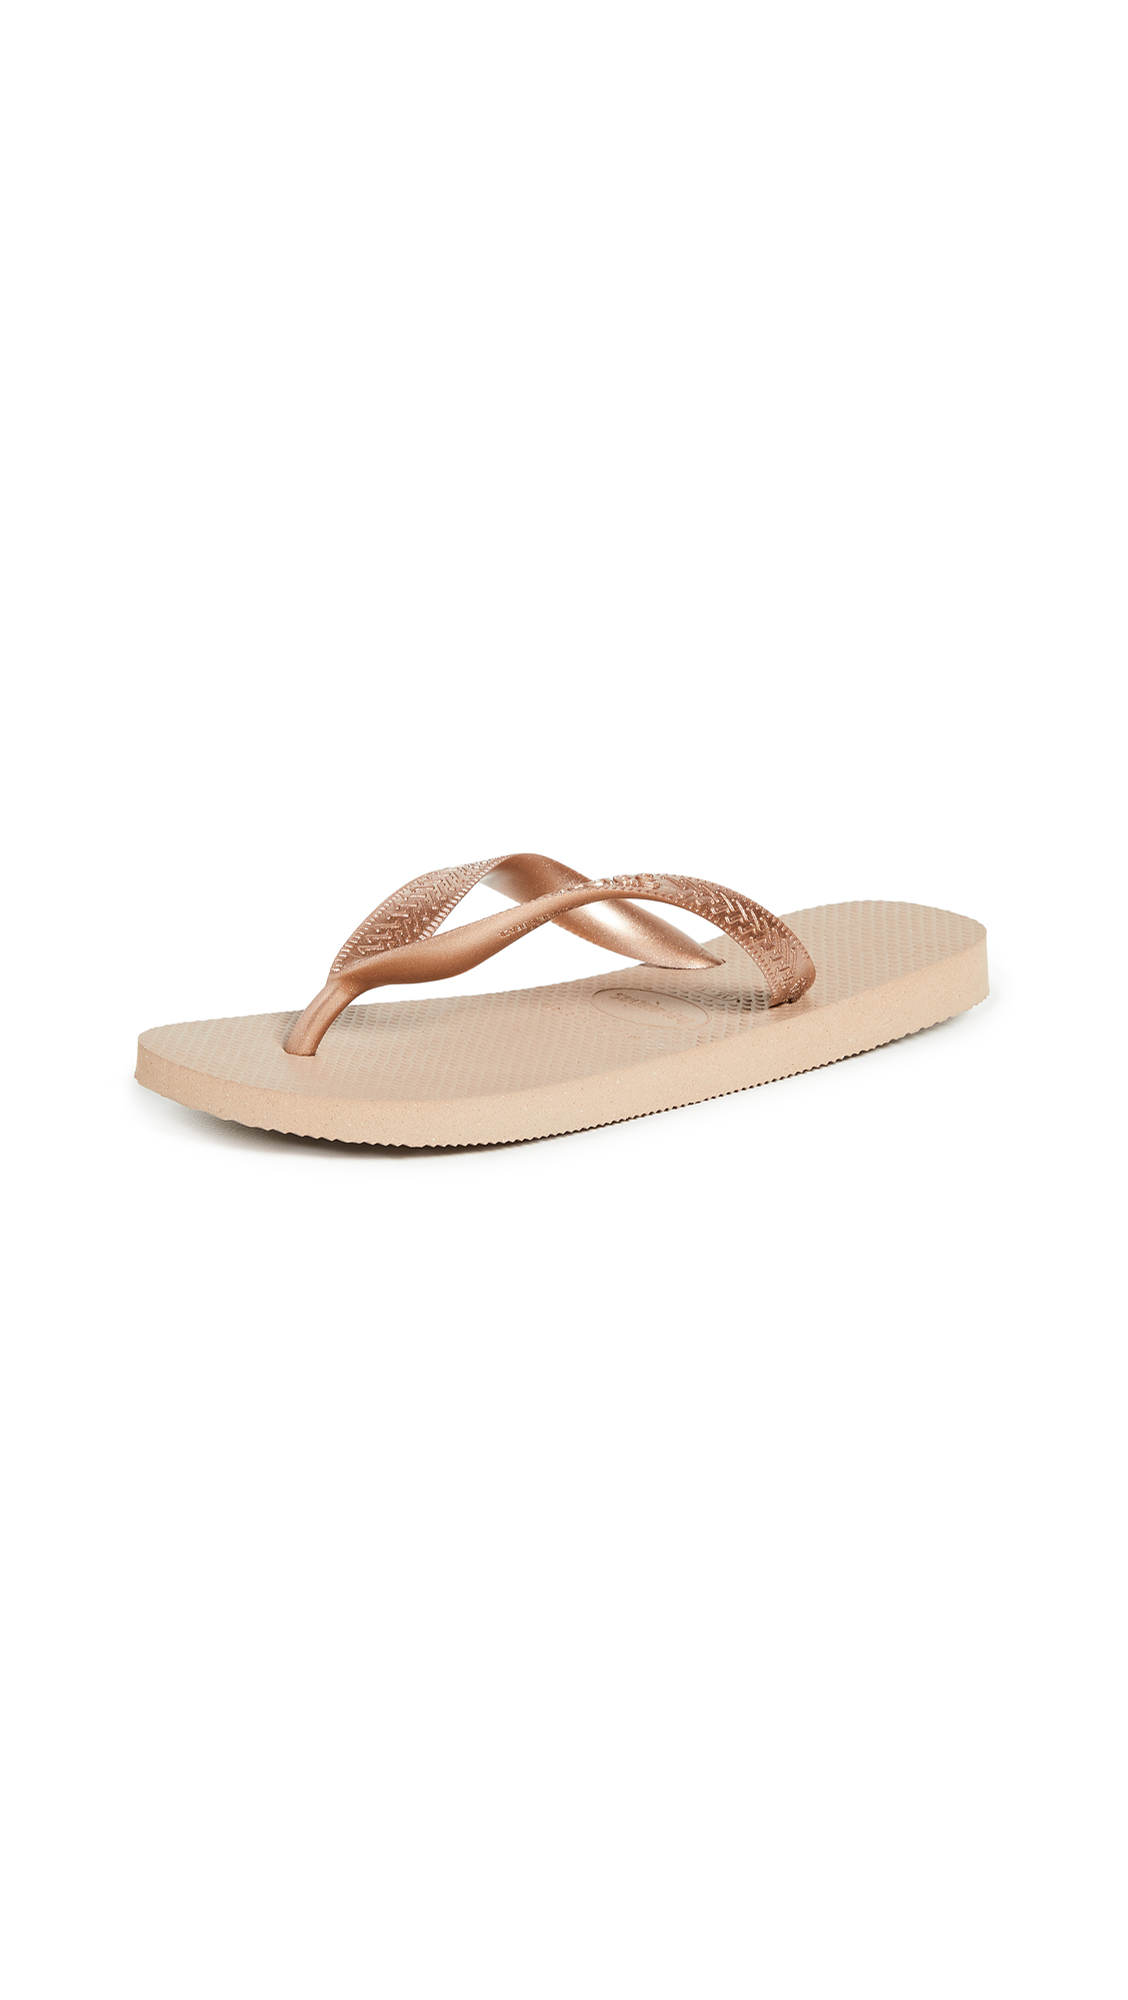 Buy Havaianas Top Tiras Flip Flops online, shop Havaianas